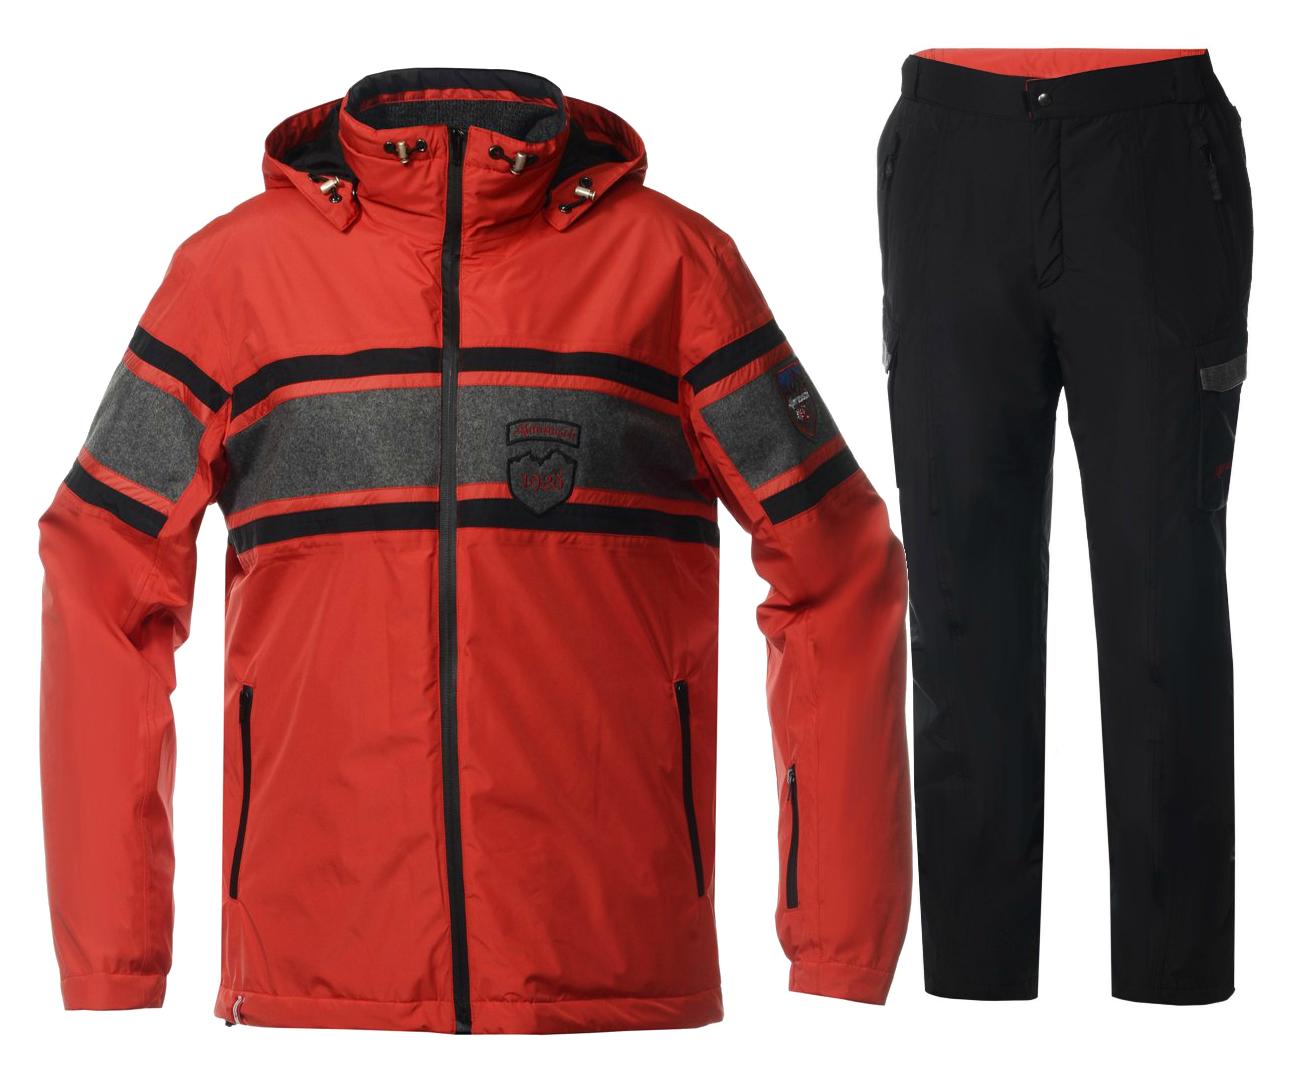 Мужской горнолыжный костюм Almrausch Staad-Hochbruck 320103-321300 красный фото